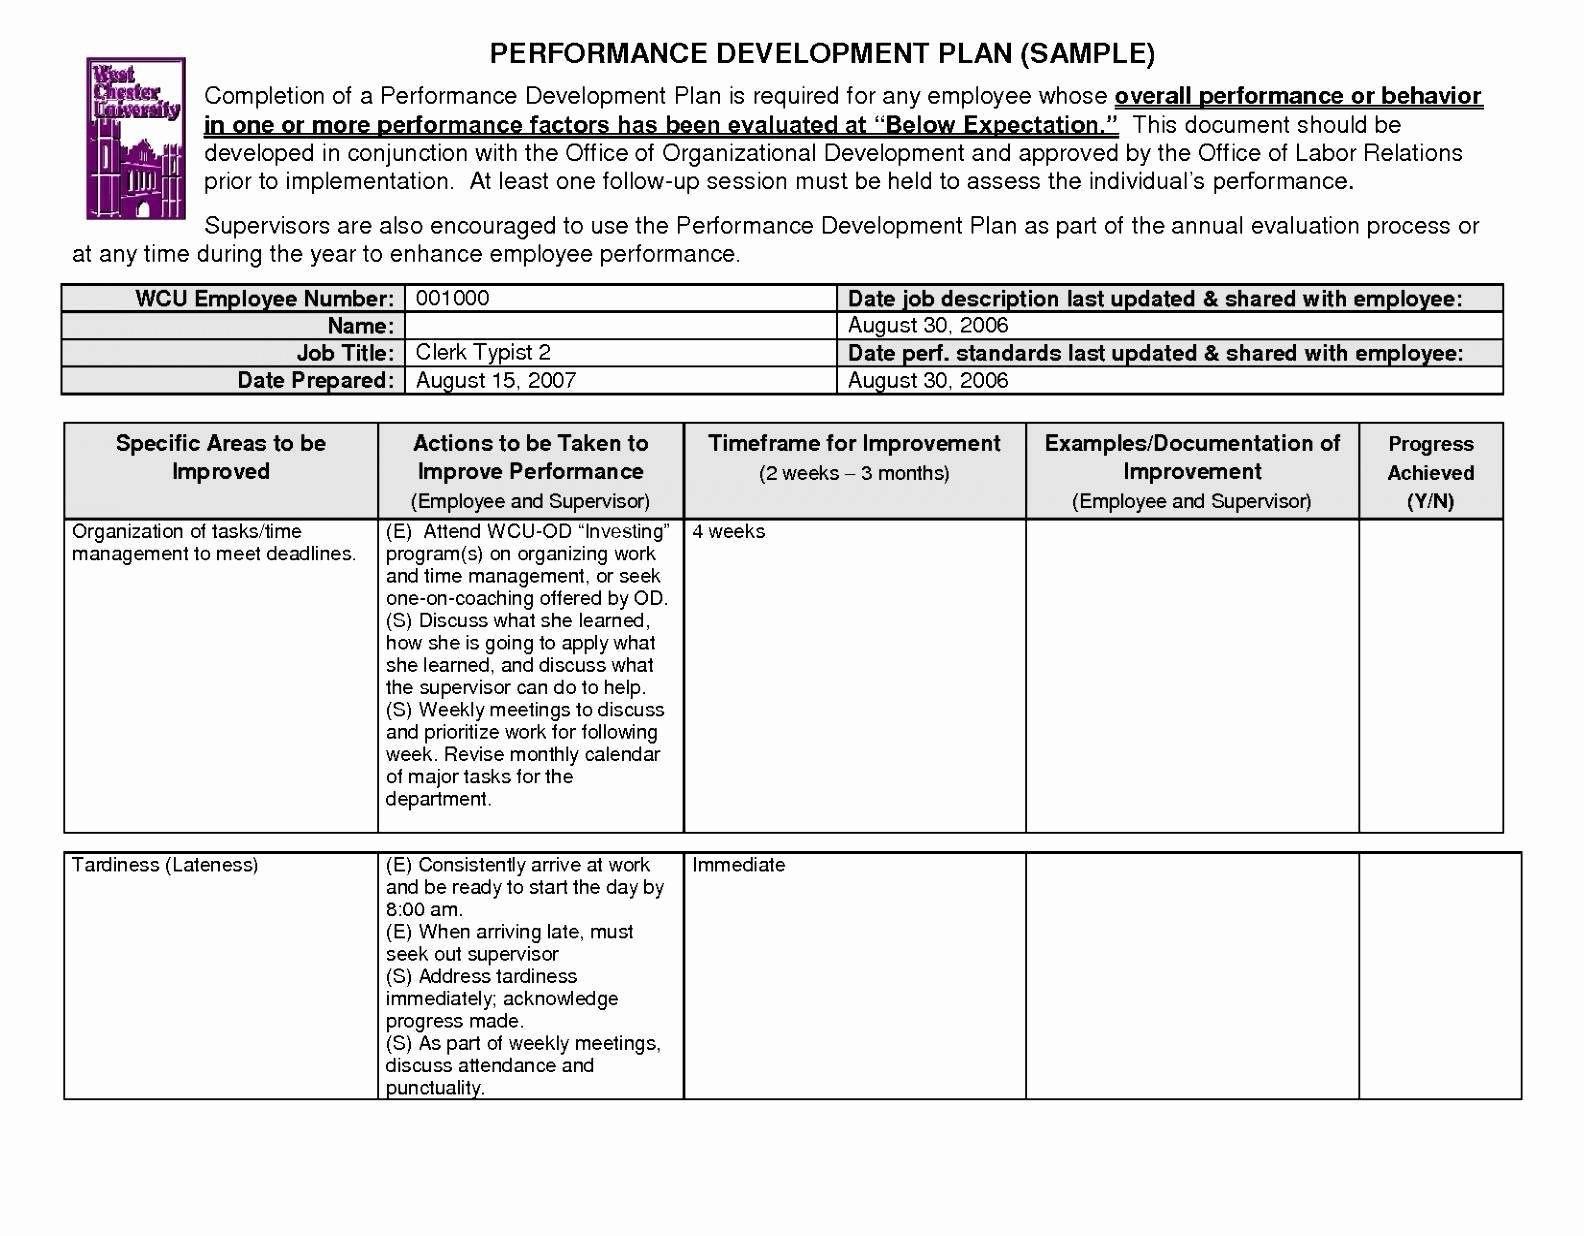 Business Process Improvement Template Performance Improvement Plan Regarding Business Process Improvement Plan Template